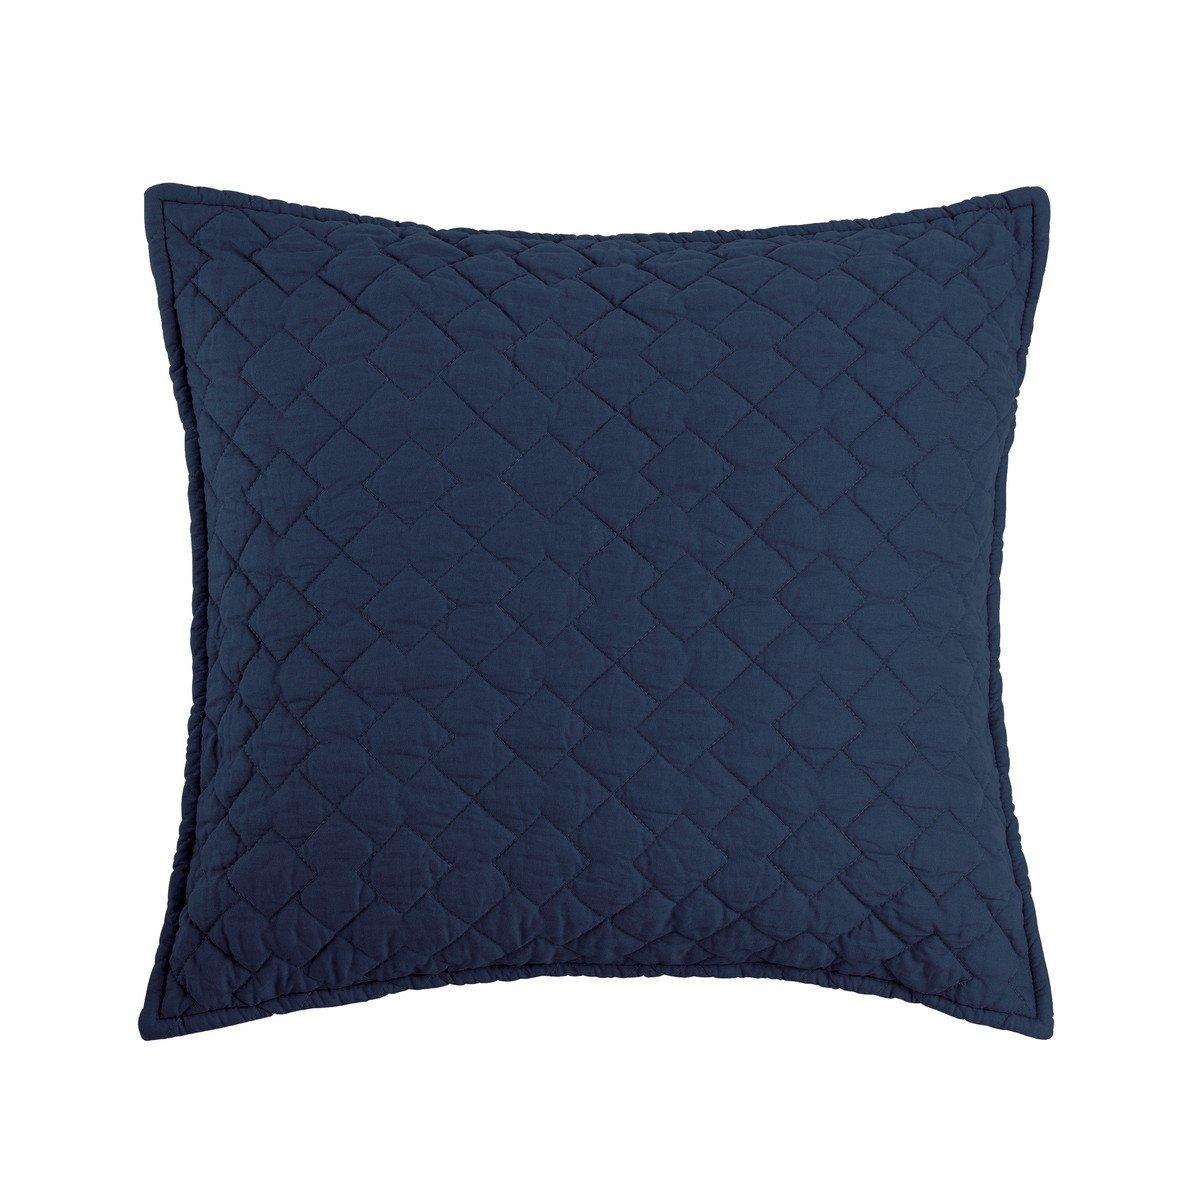 Regent Indigo Quilted Pillow